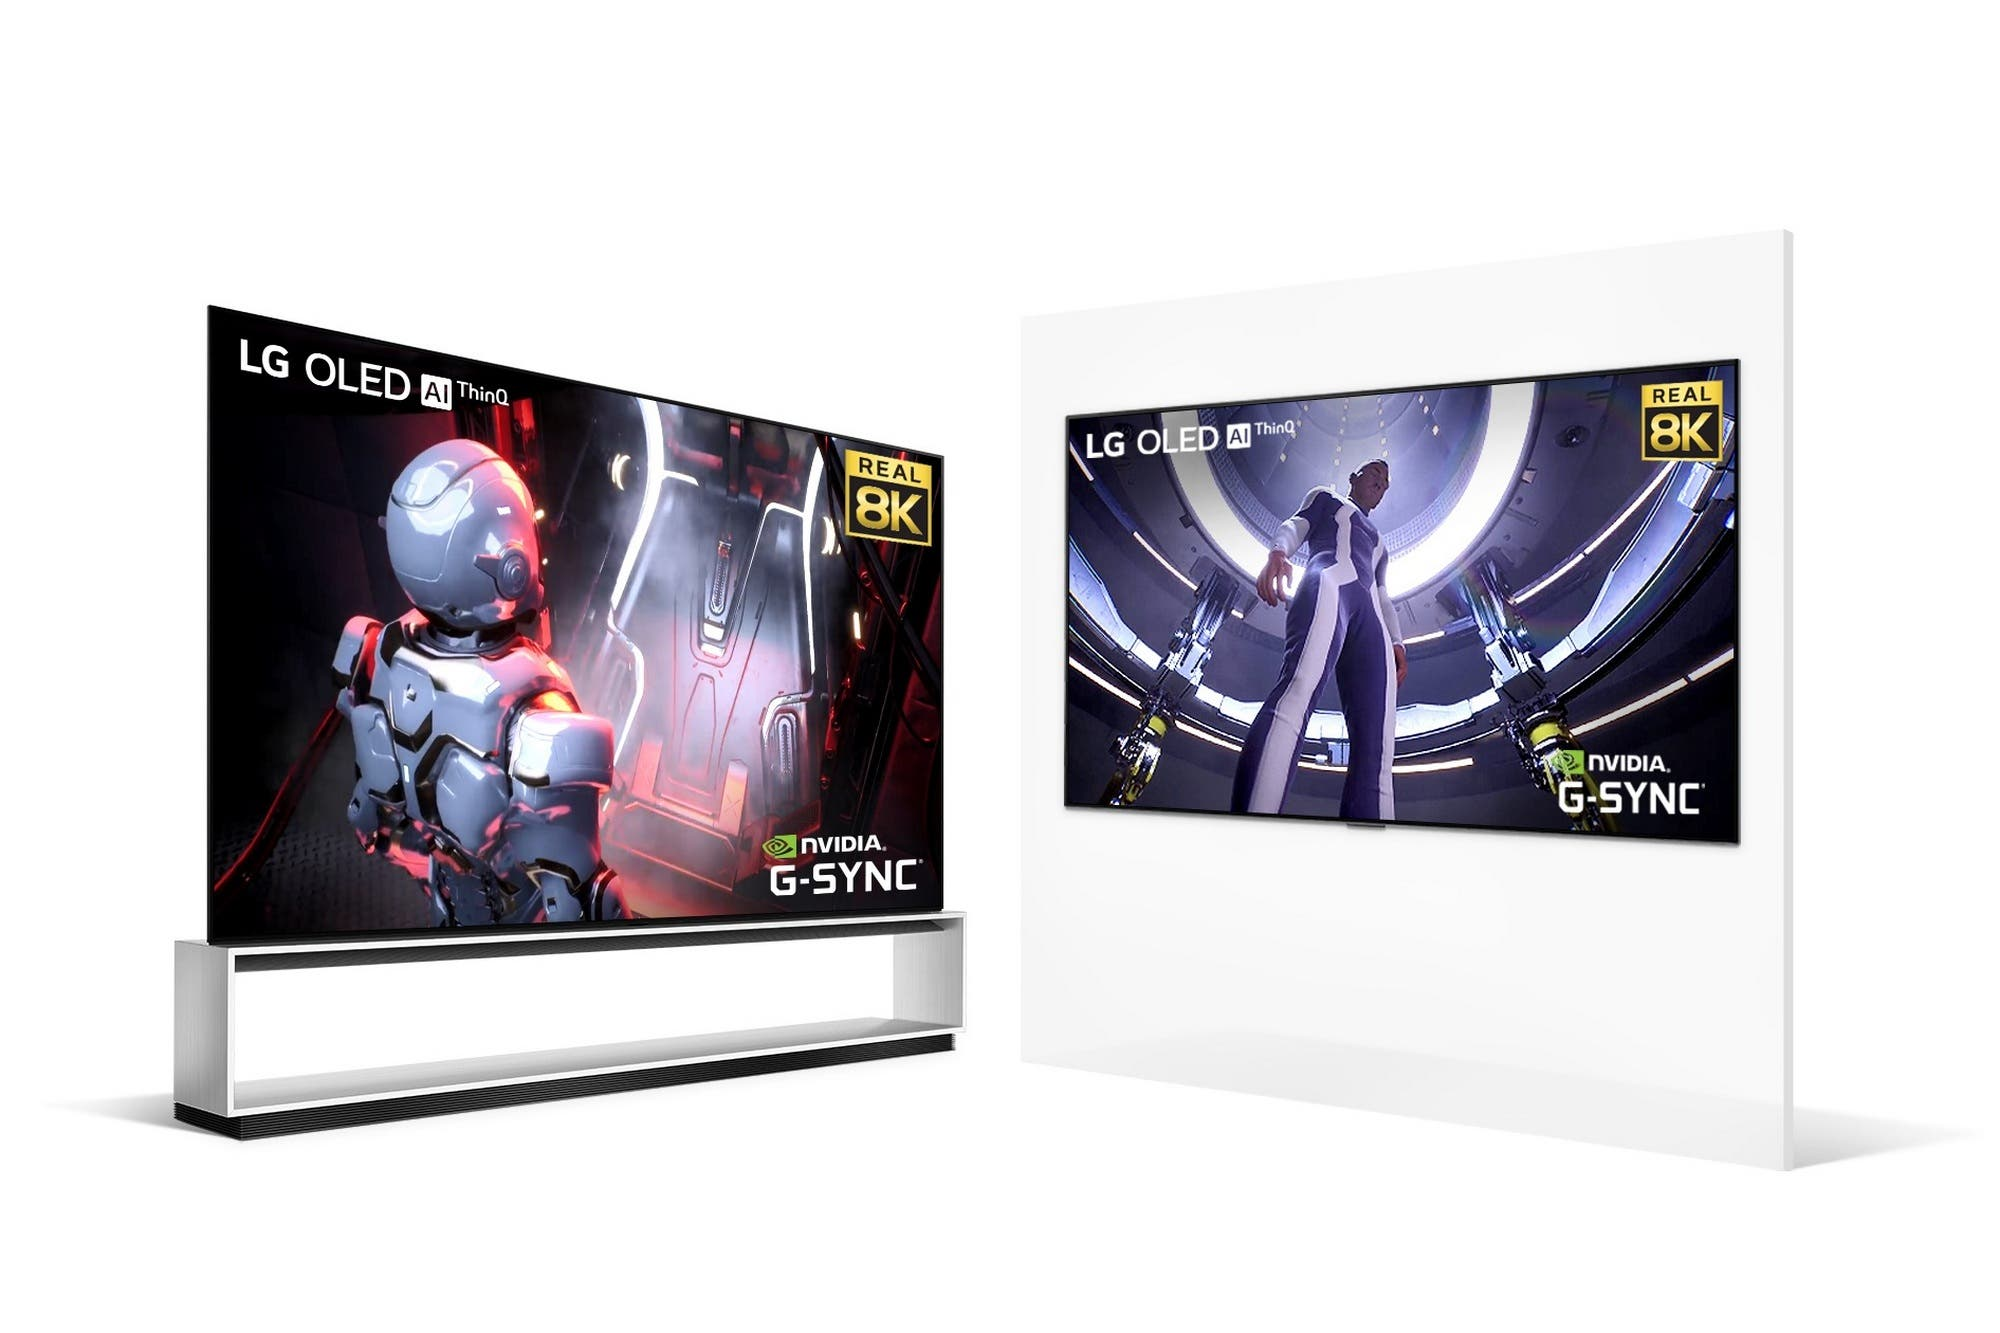 LG suma las placas de video Nvidia GeForce RTX 30 en sus televisores OLED 8K